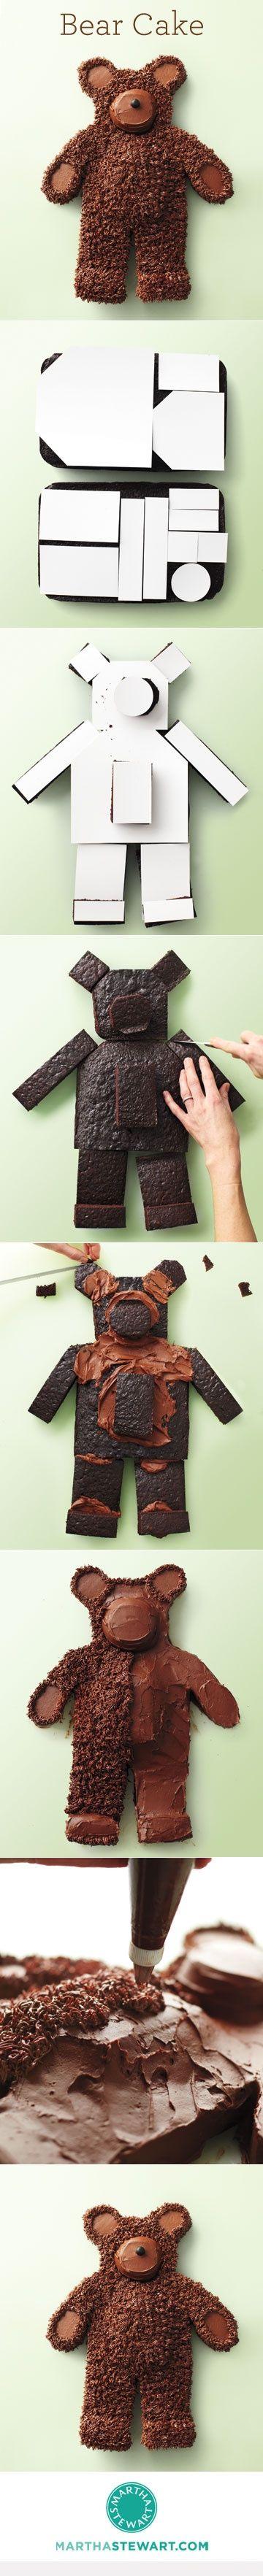 How to Make a Bear Cake - http://dessertideaslove.com/dessert/how-to-make-a-bear-cake.html